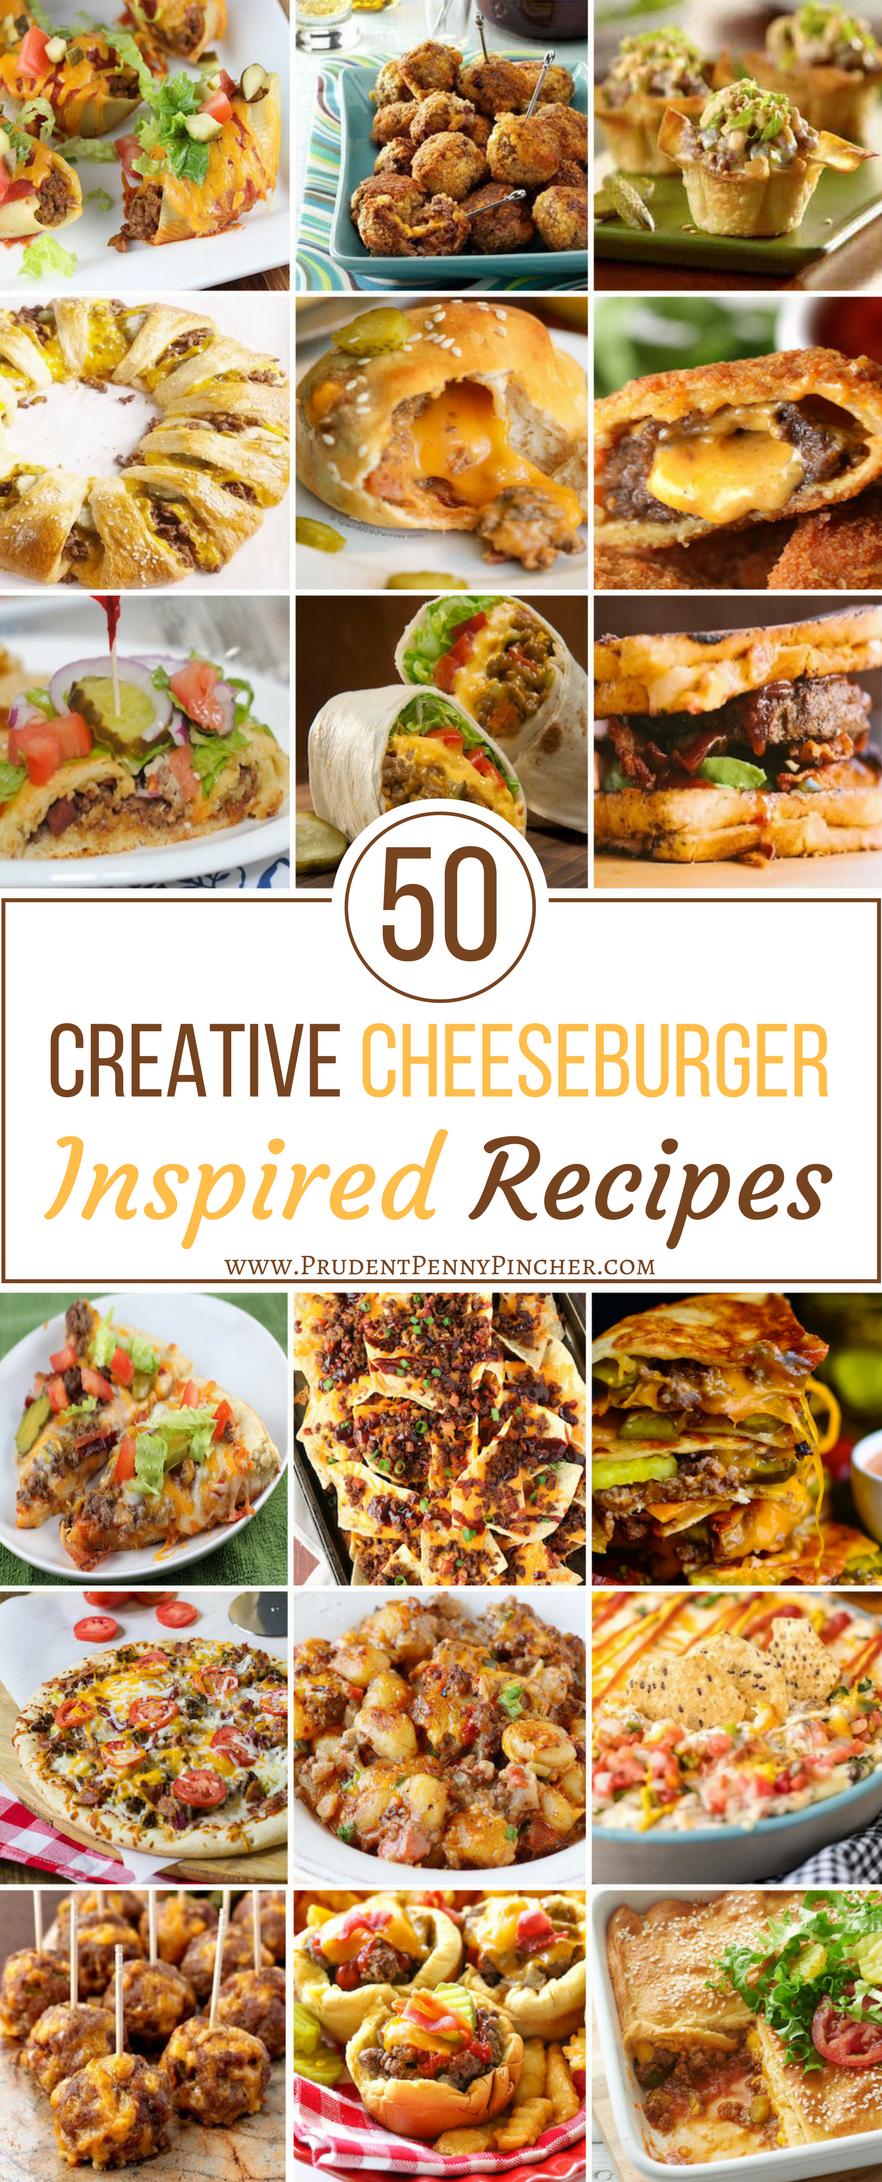 cheeseburger-inspired